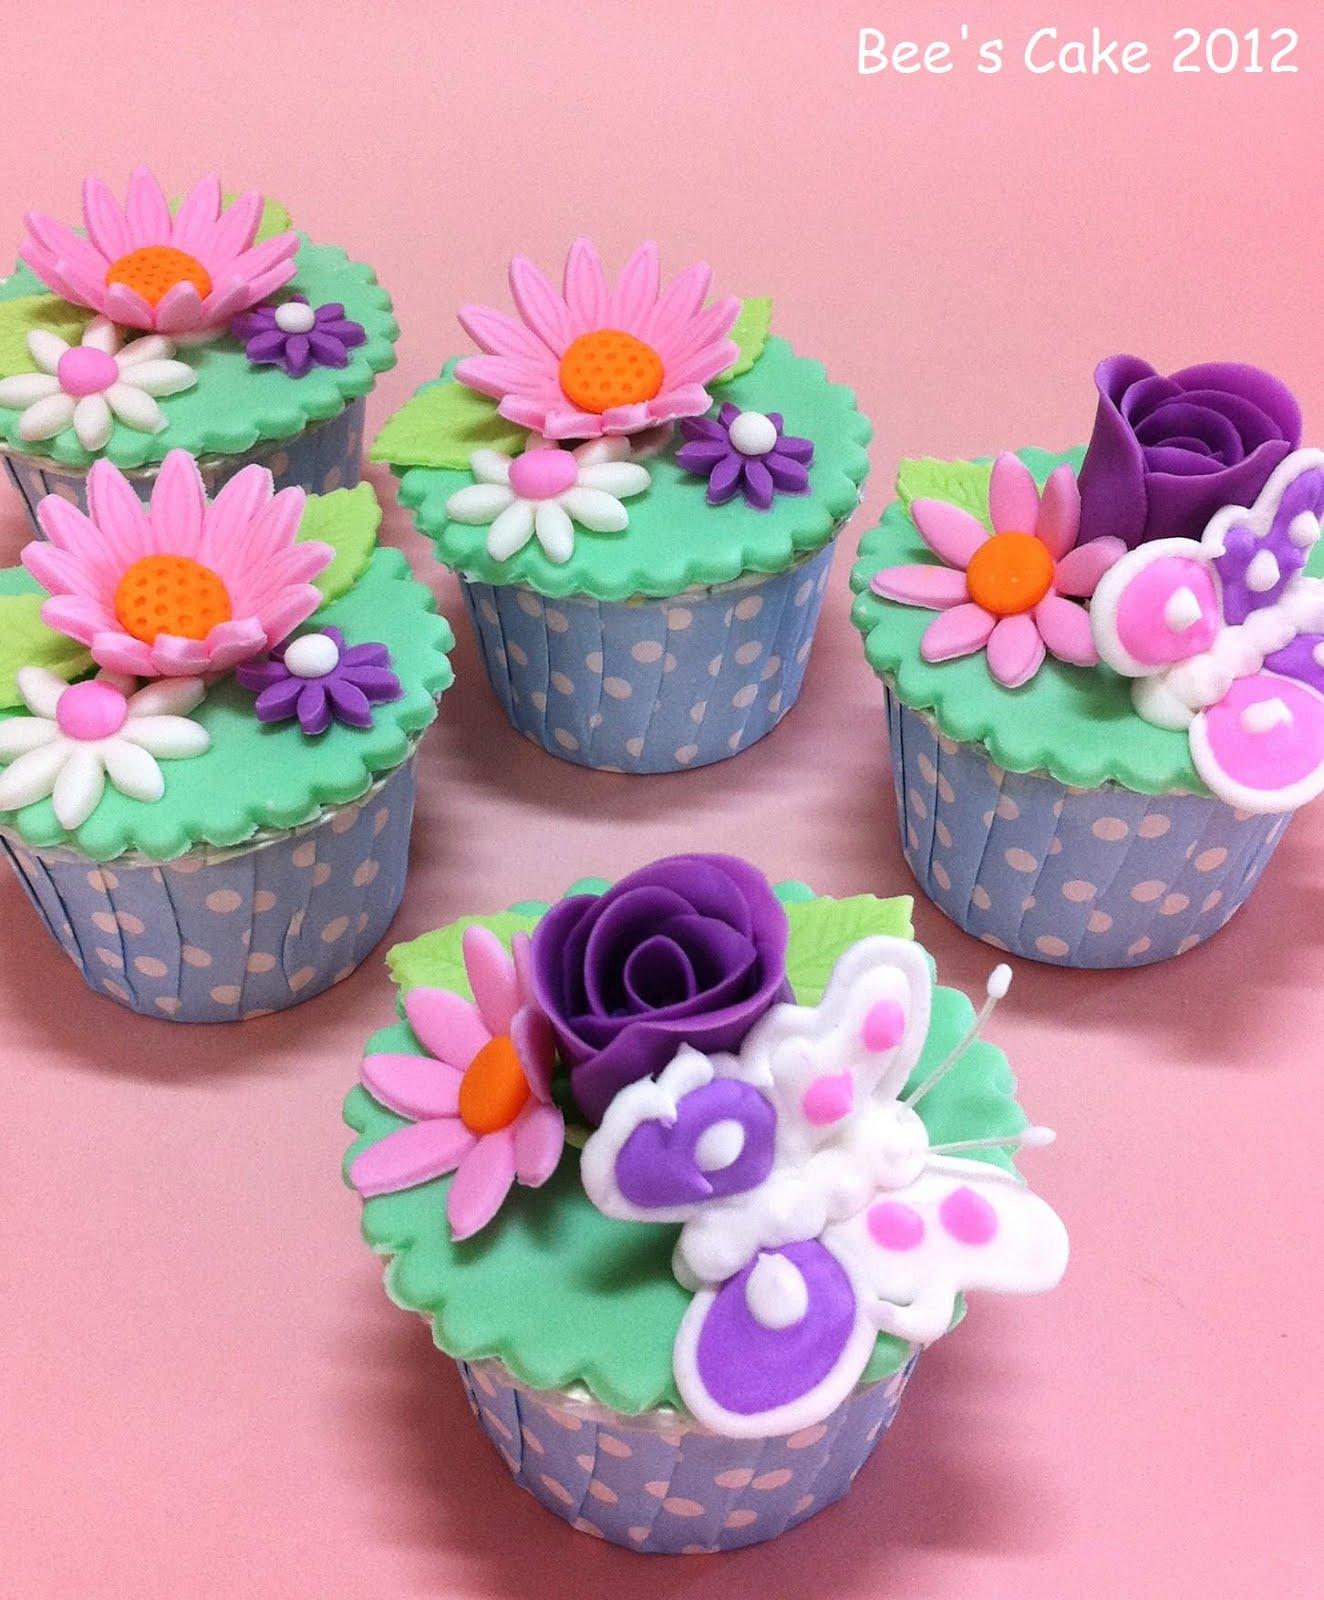 Bee's Cake: Flower Cupcakes